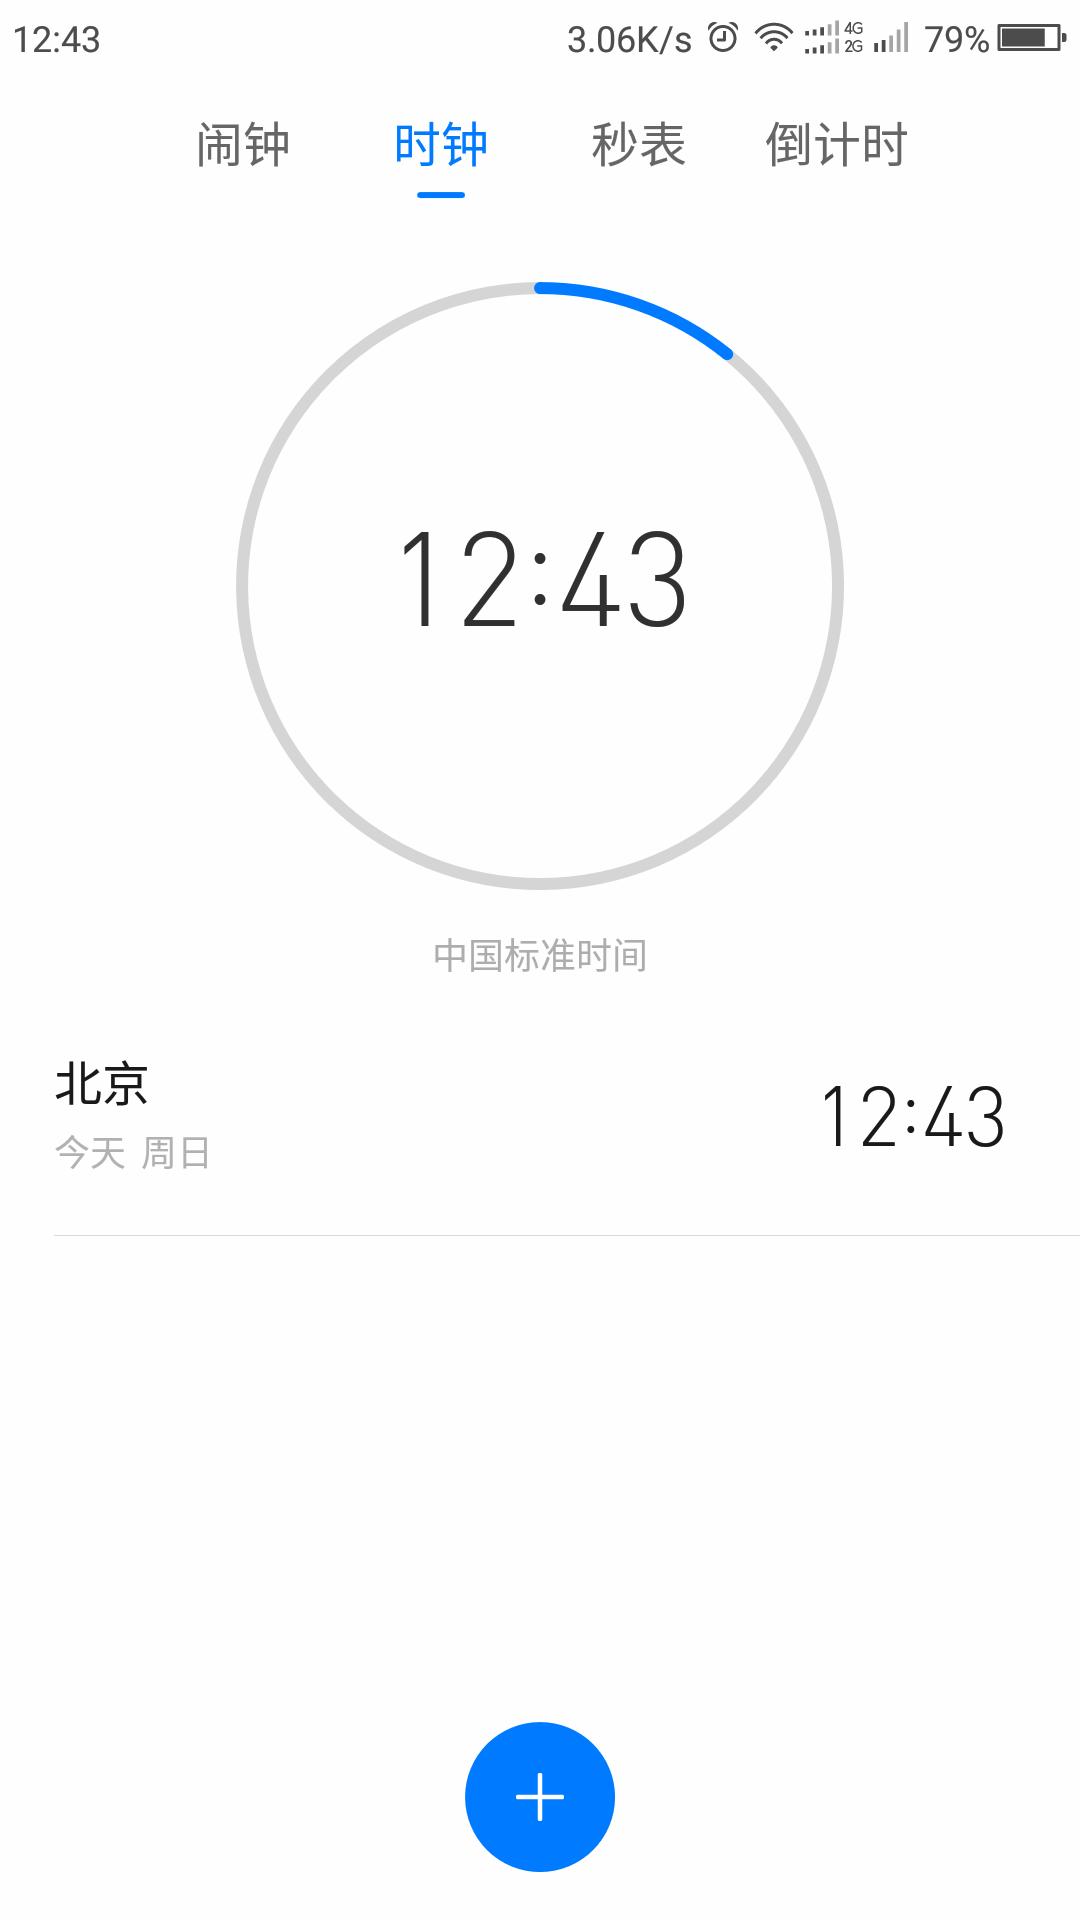 Screenshot_2019-04-28-12-43-10.png